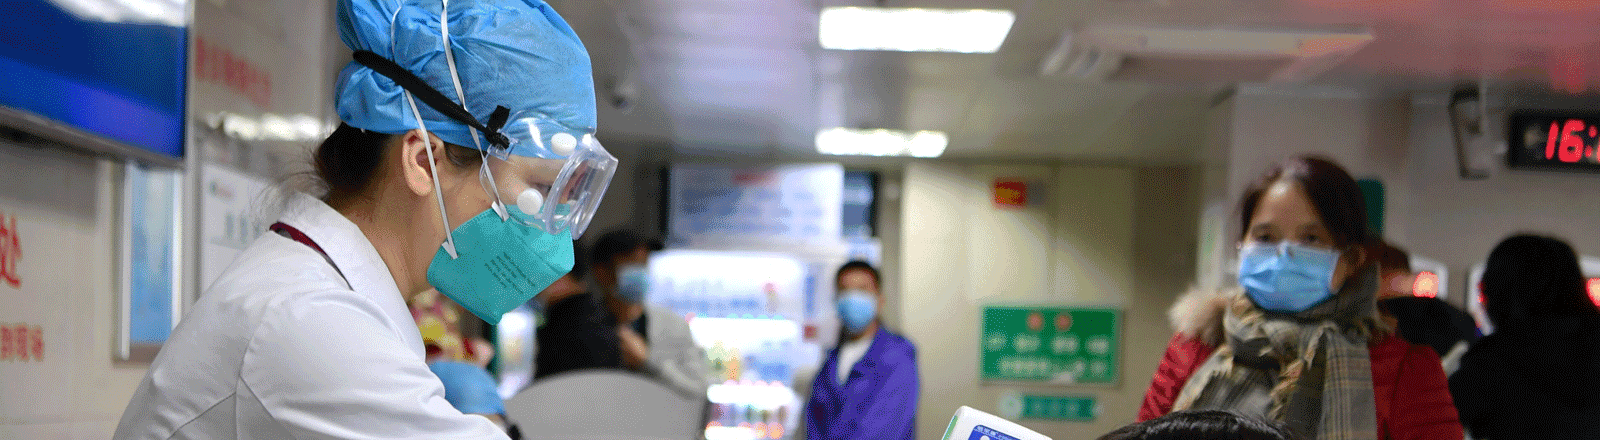 WHO ruft internationalen Gesundheitsnotstand wegen Coronavirus aus